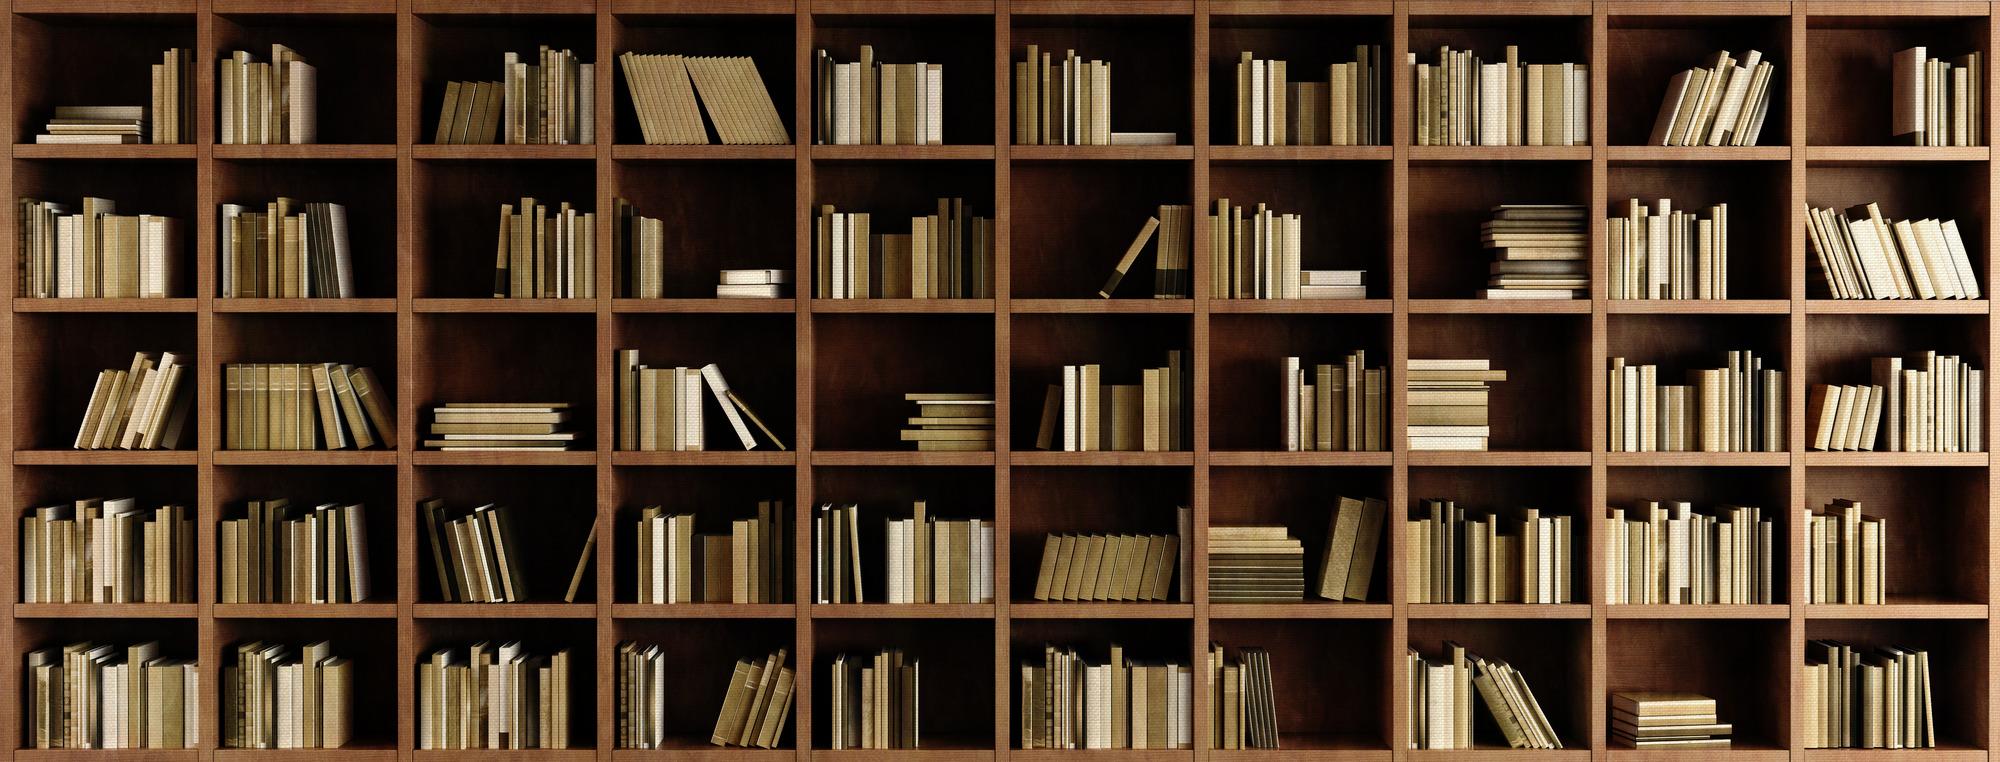 3d Brick Wallpaper Amazon Bookshelf Wallpapers Group 33